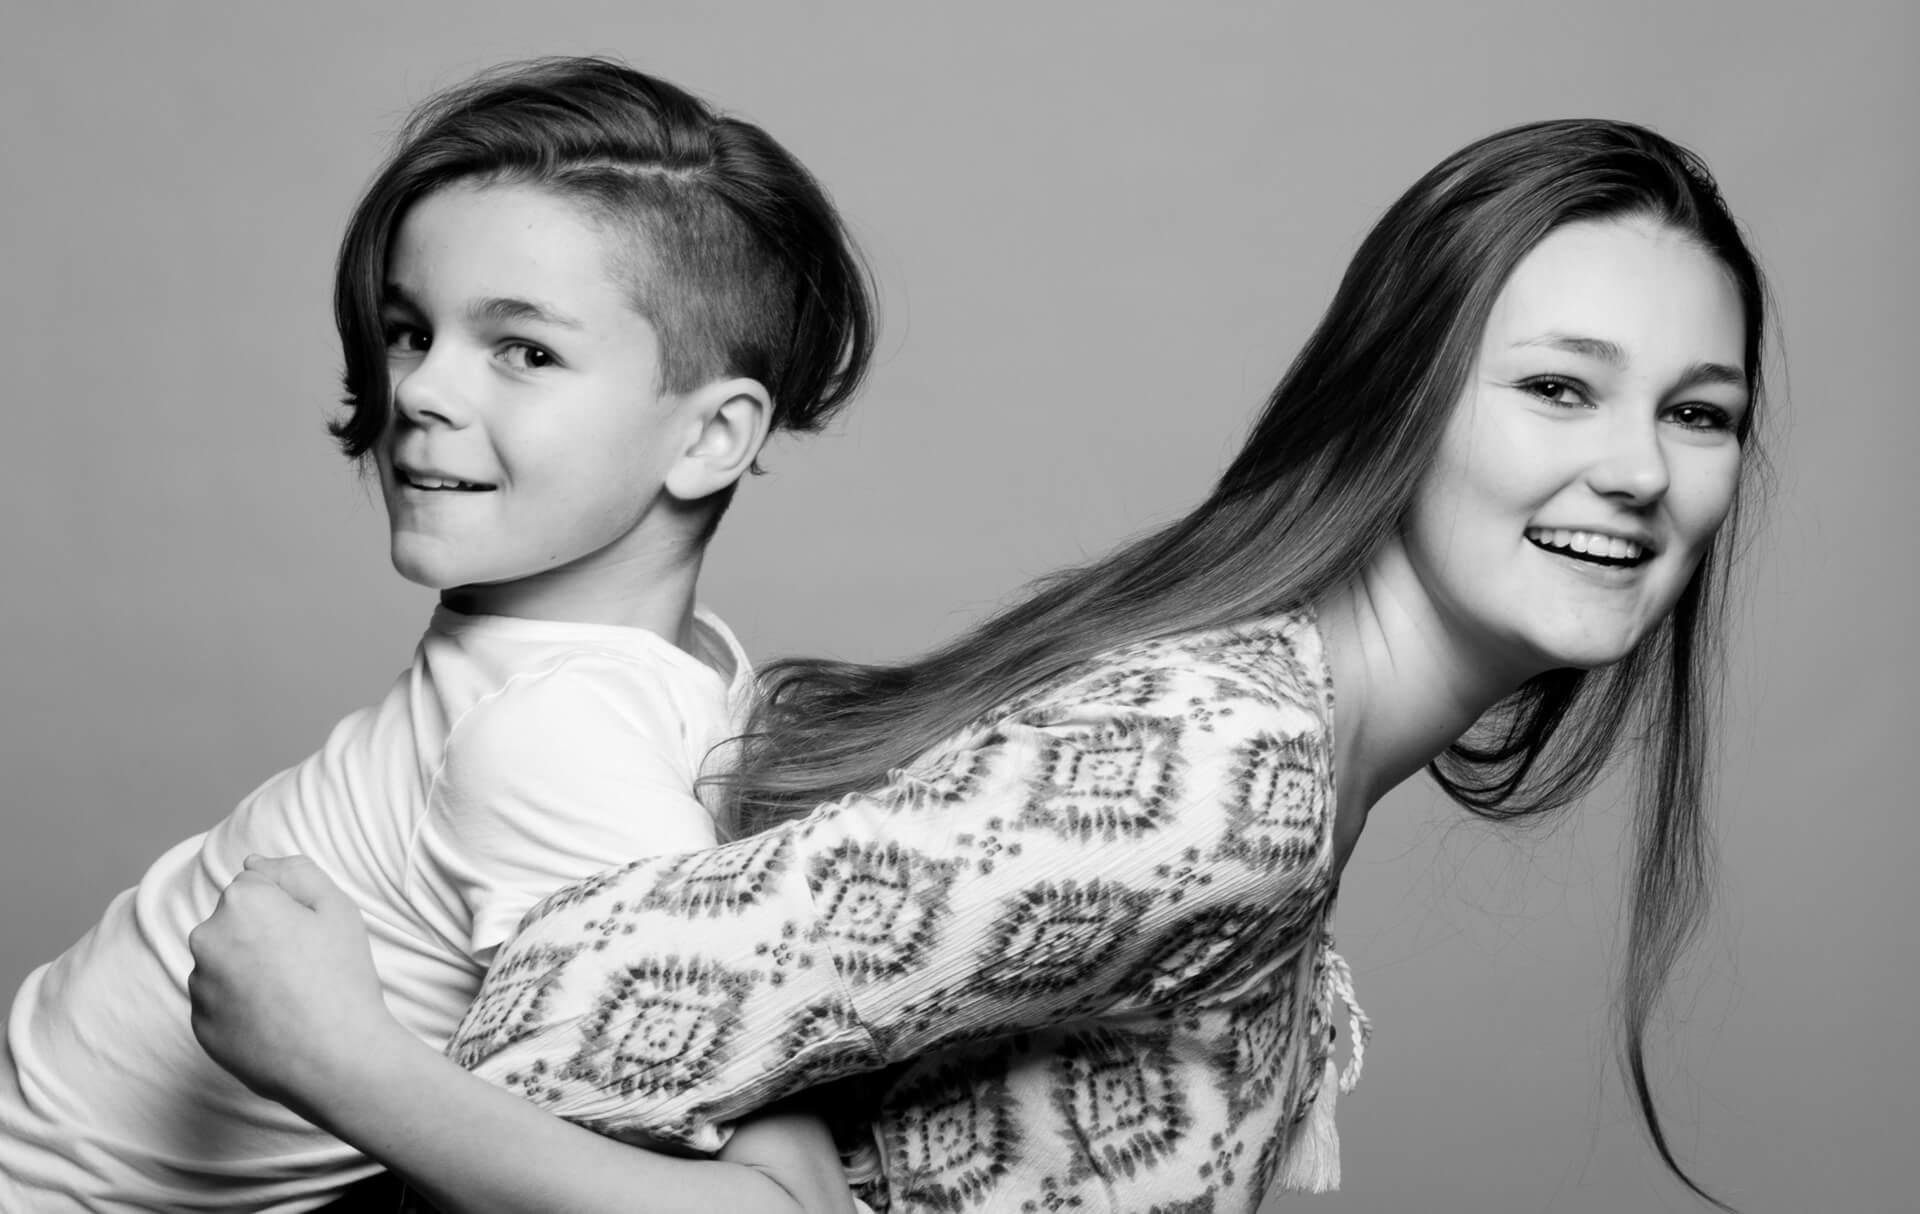 Kinder erwachsen Spiele familienfotografie_fotostudio